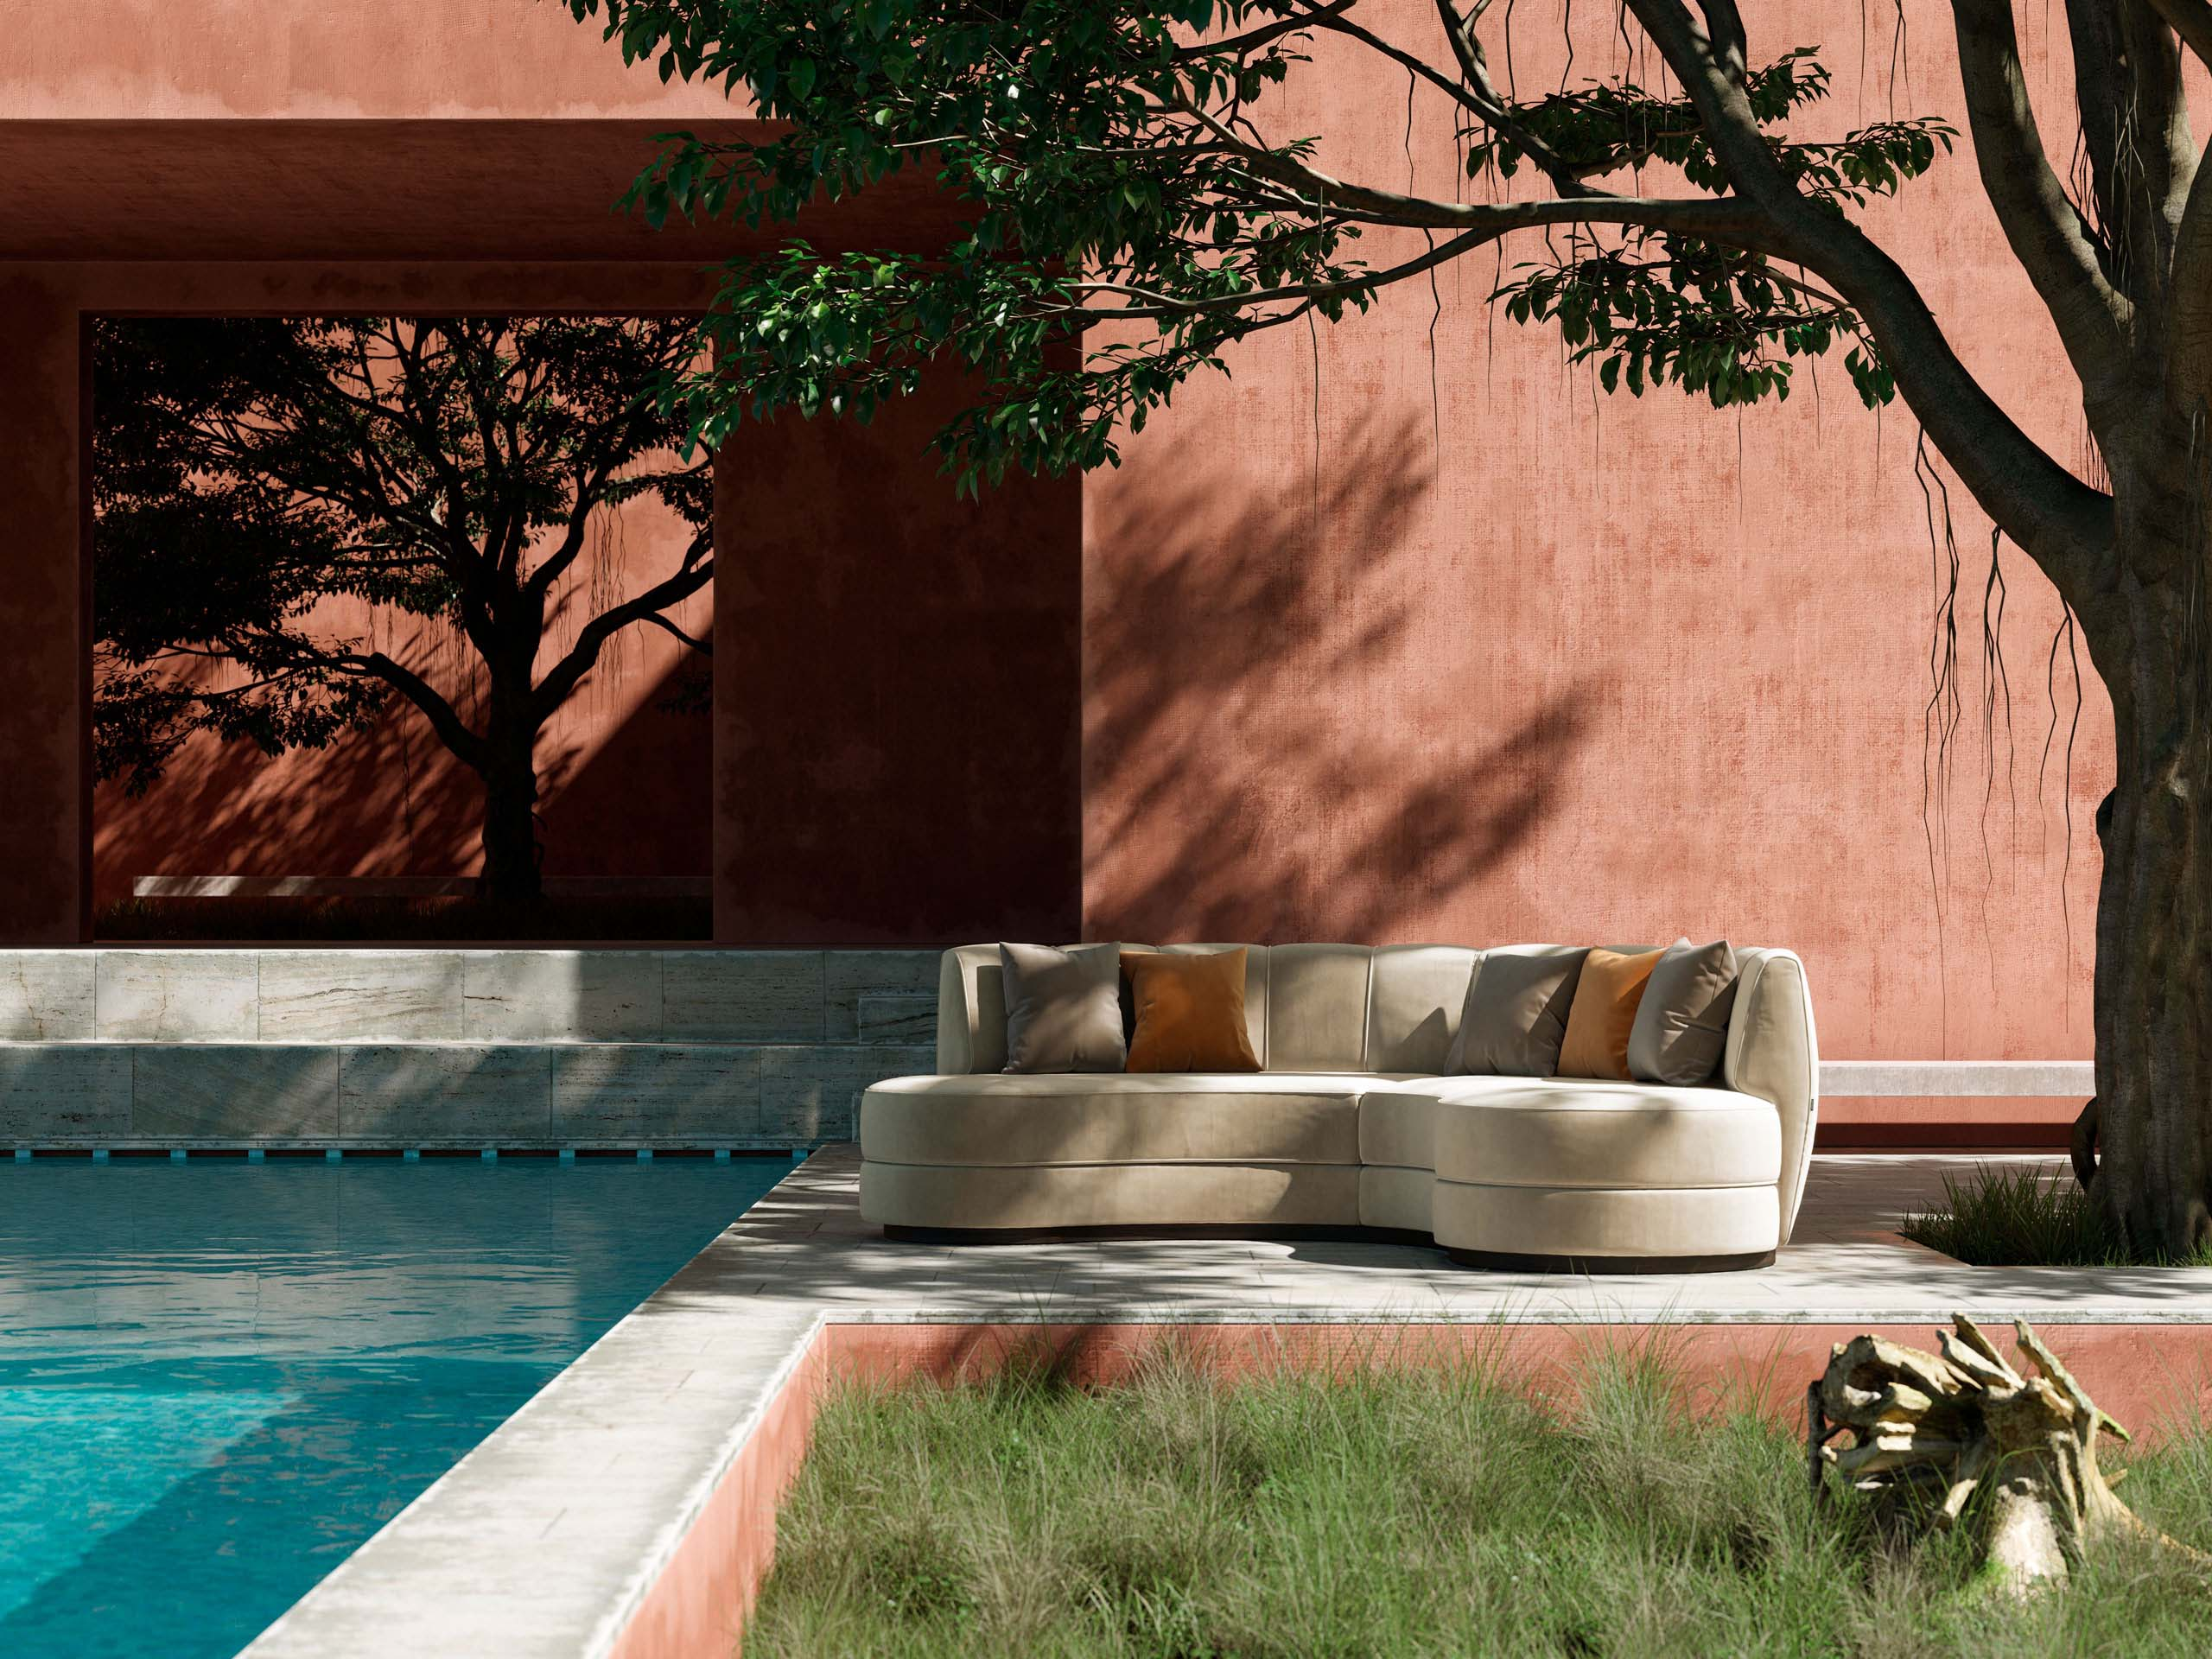 stela-sofa-domkapa-new-collection-2021-living-room-decor-1